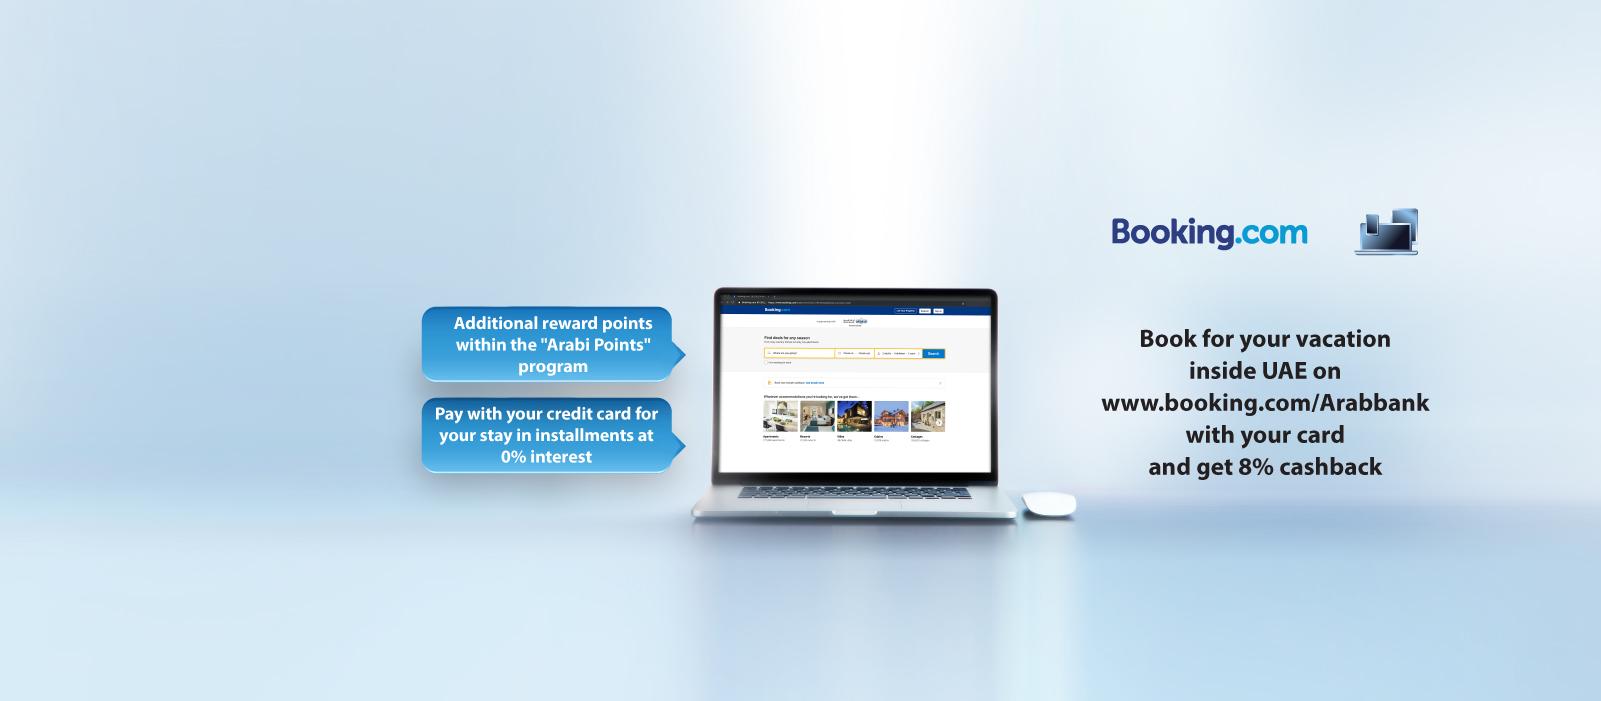 BookingOffer